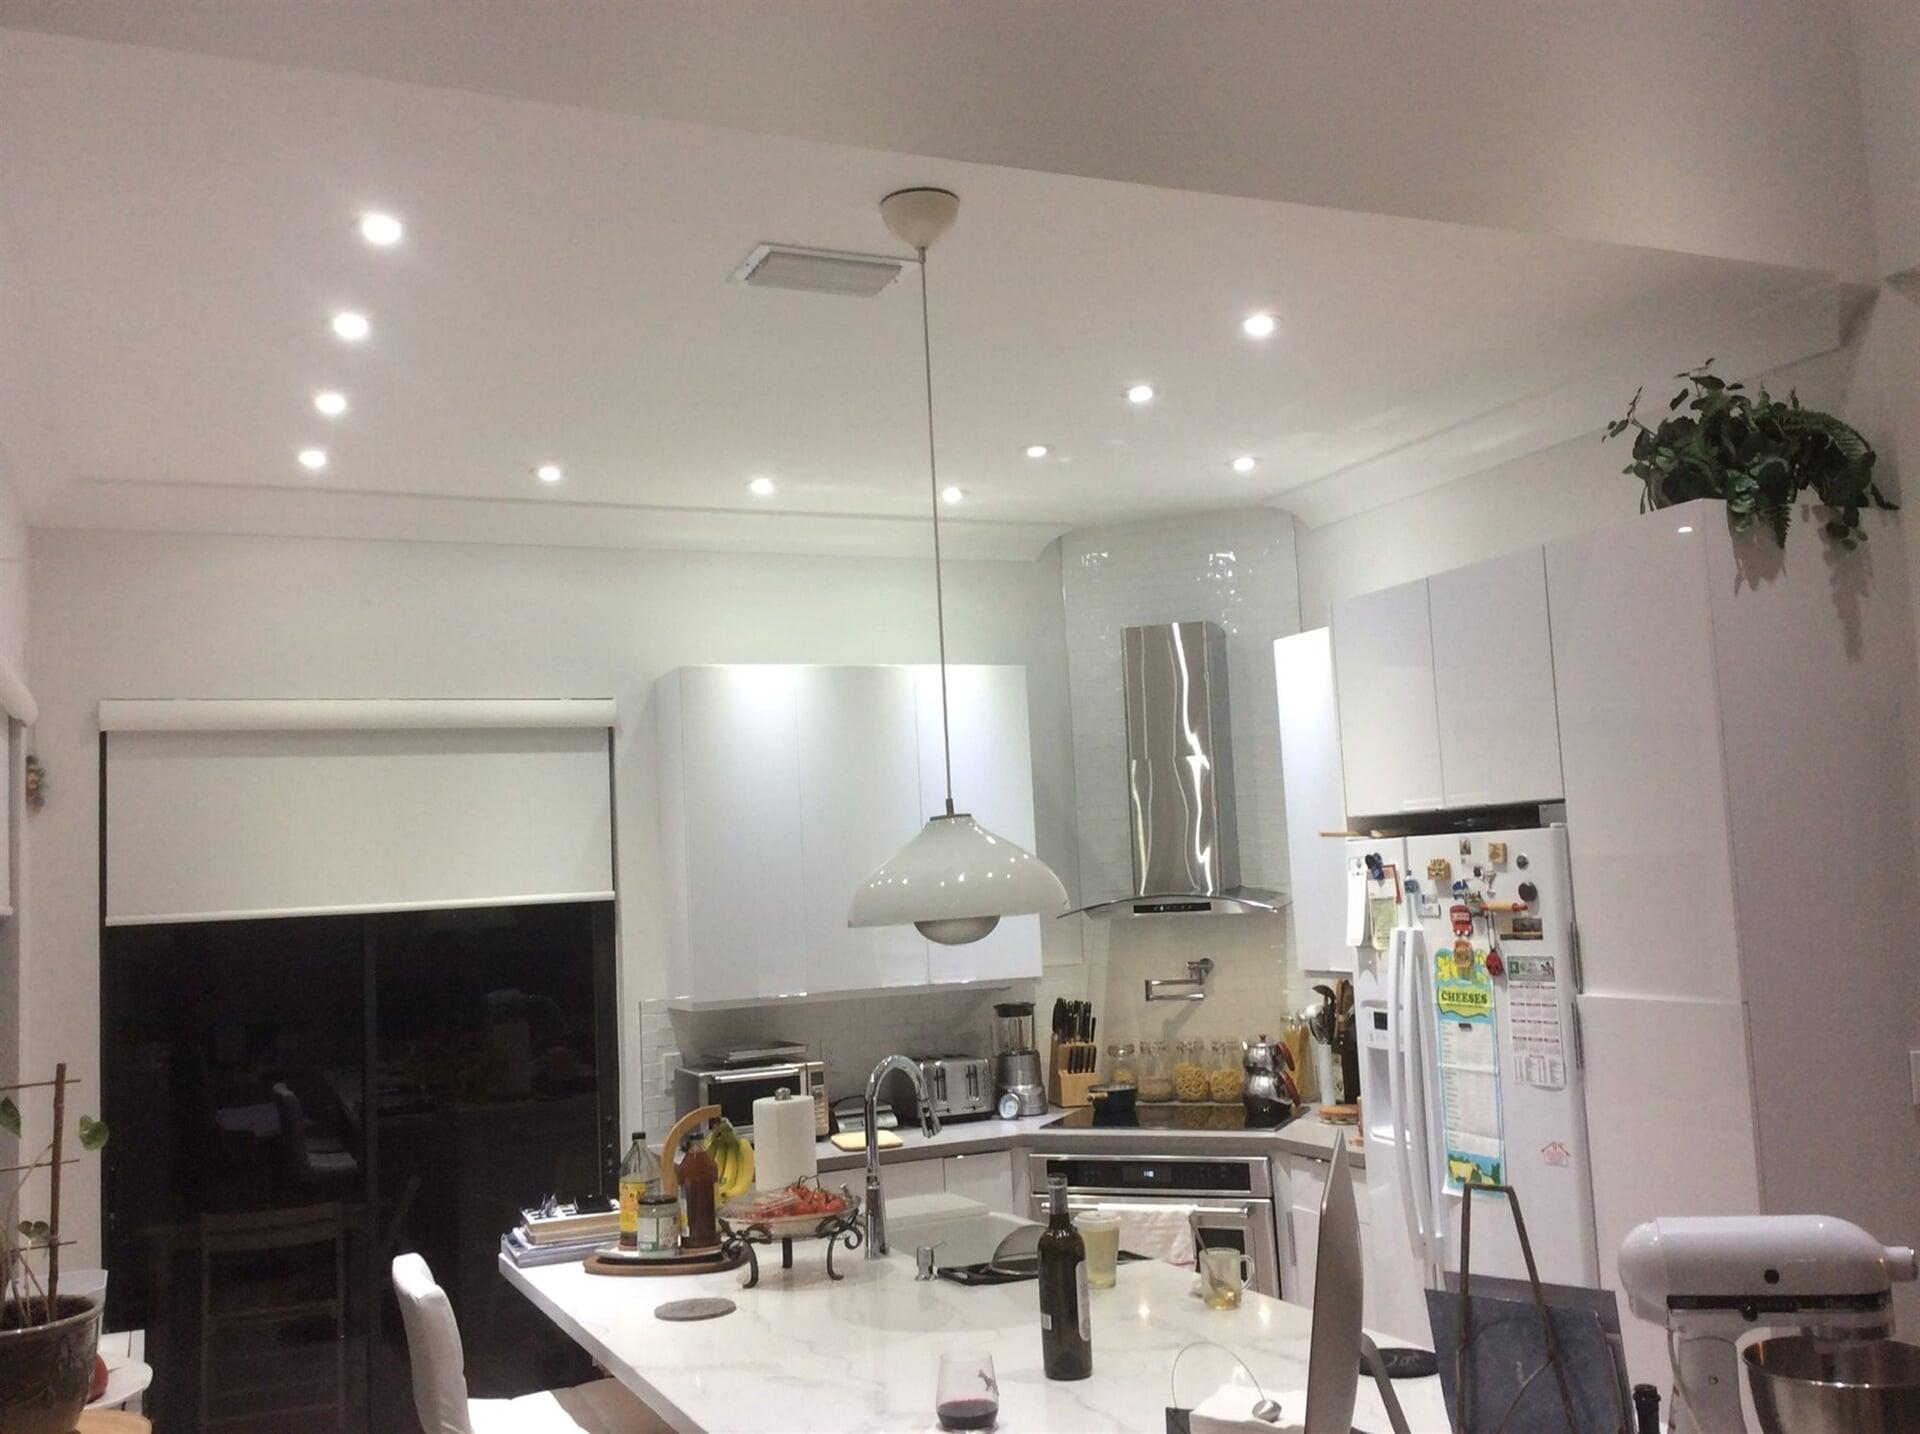 Custom kitchen lighting in Jupiter, FL from Floors For You Kitchen & Bath